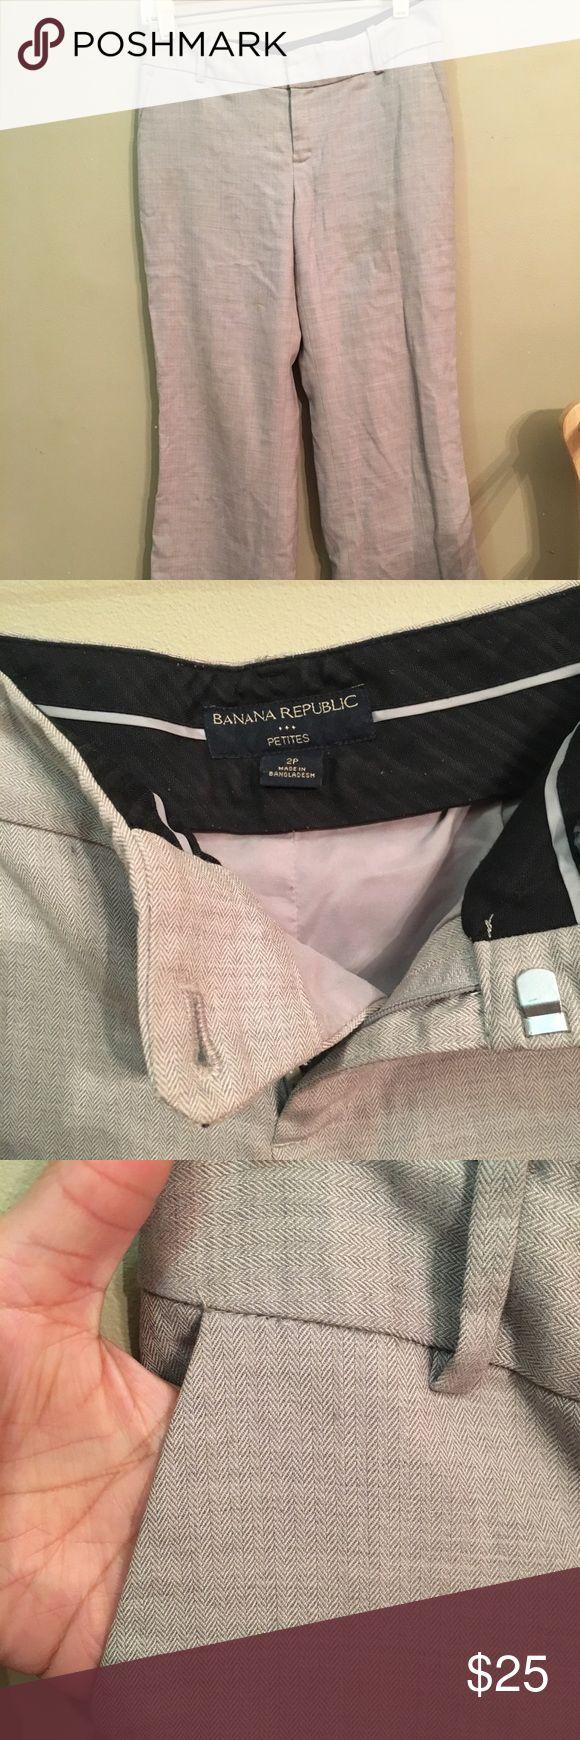 BR factory work pants. 40% wool. Slight flaws, please see pics. Banana Republic Pants Trousers